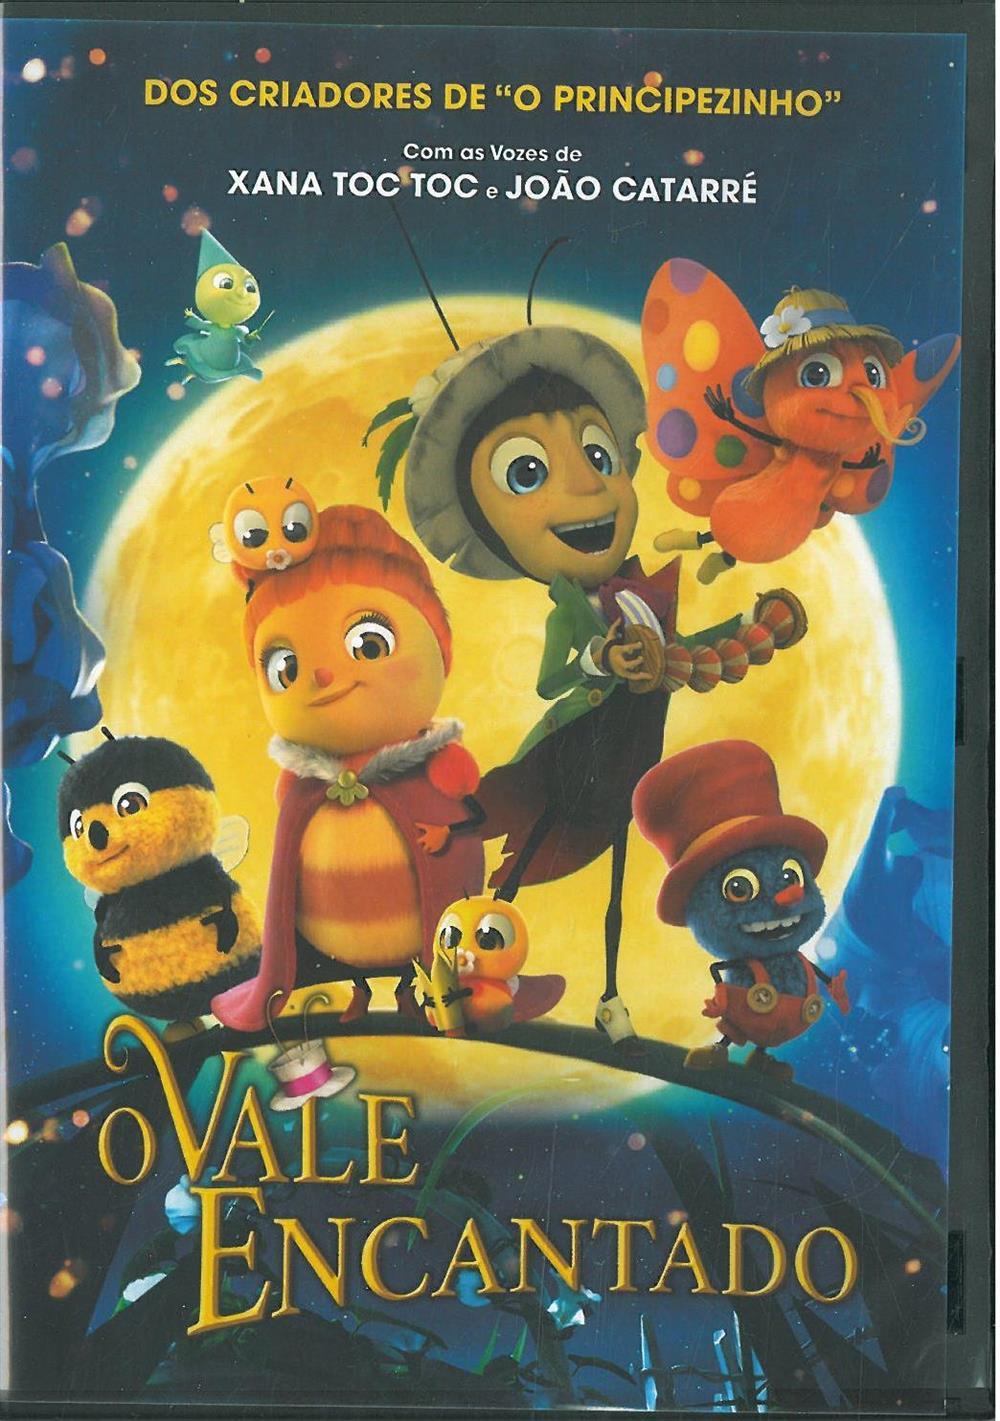 O vale encantado_DVD.jpg